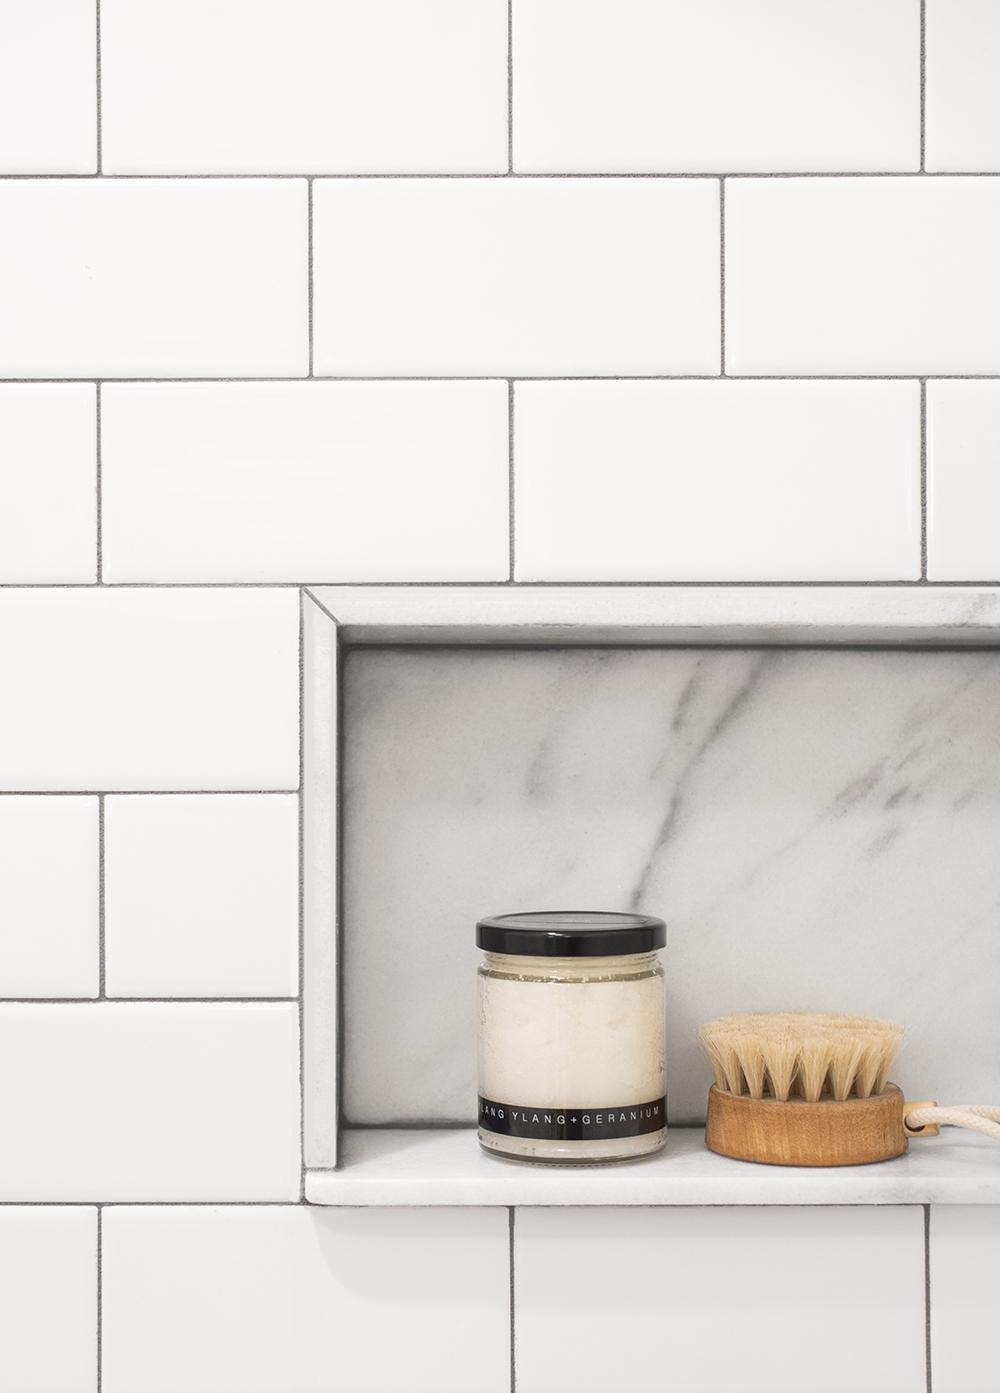 DIY Sugar Scrub - roomfortuesday.com